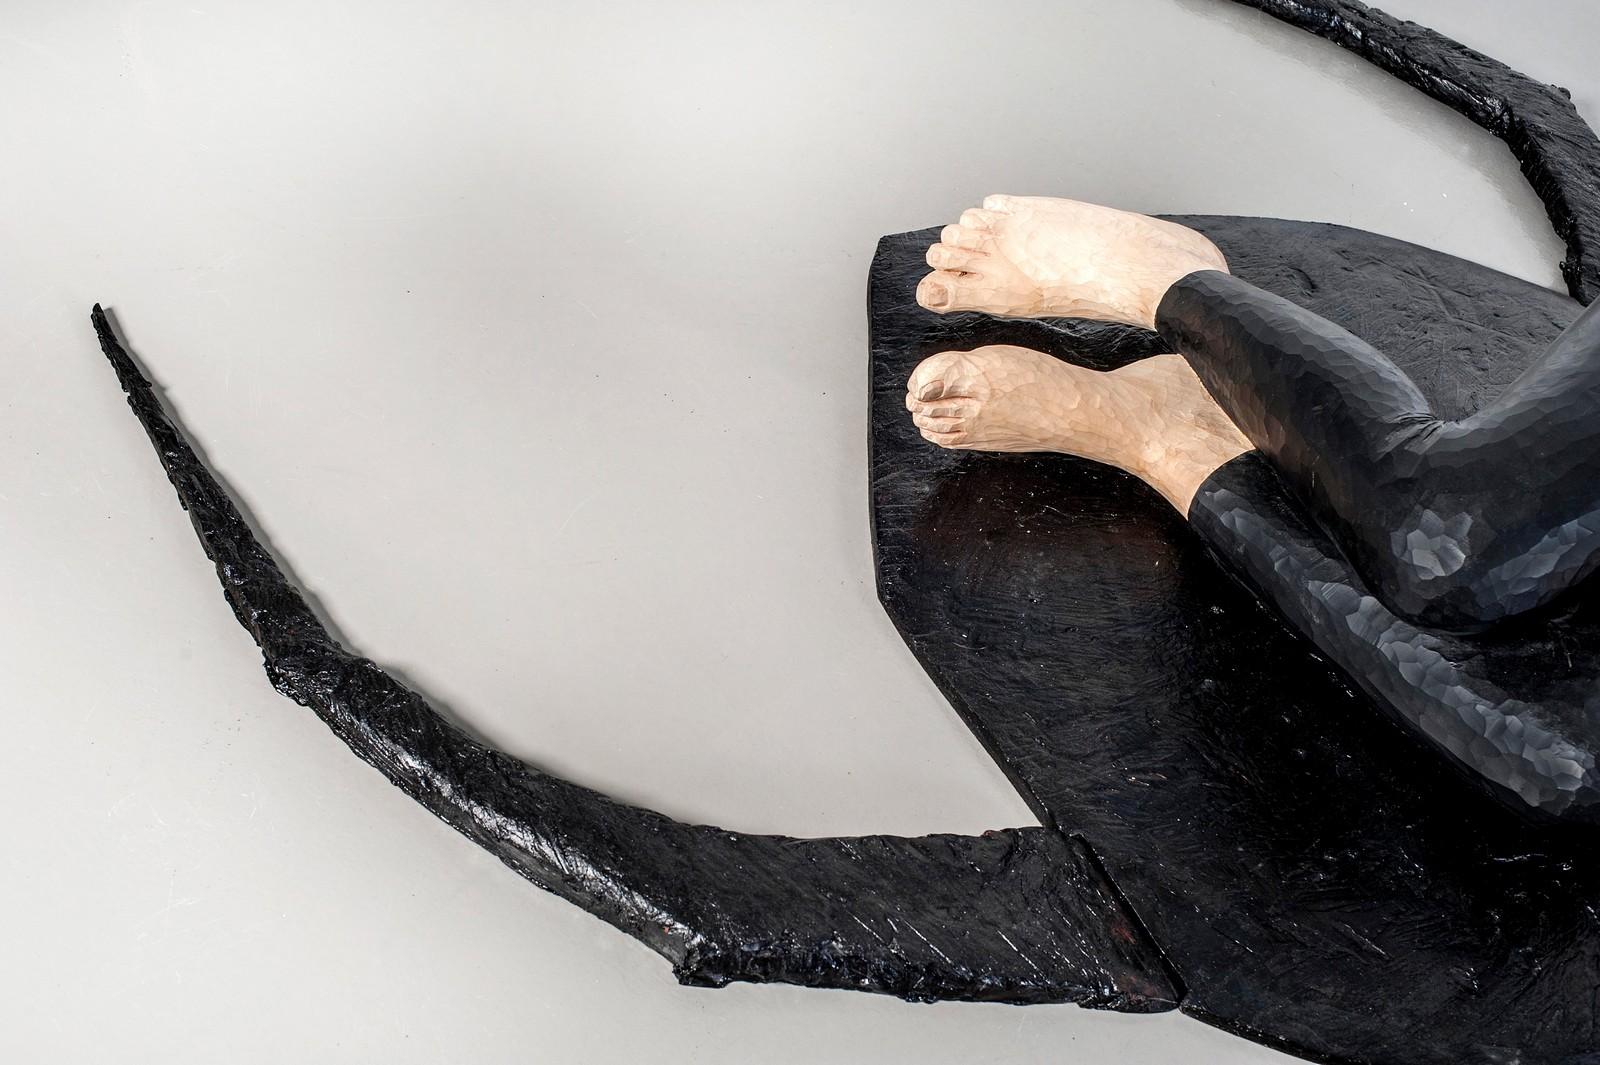 Metanoia series, 2013, wood, 37 x 58 x 128 cm